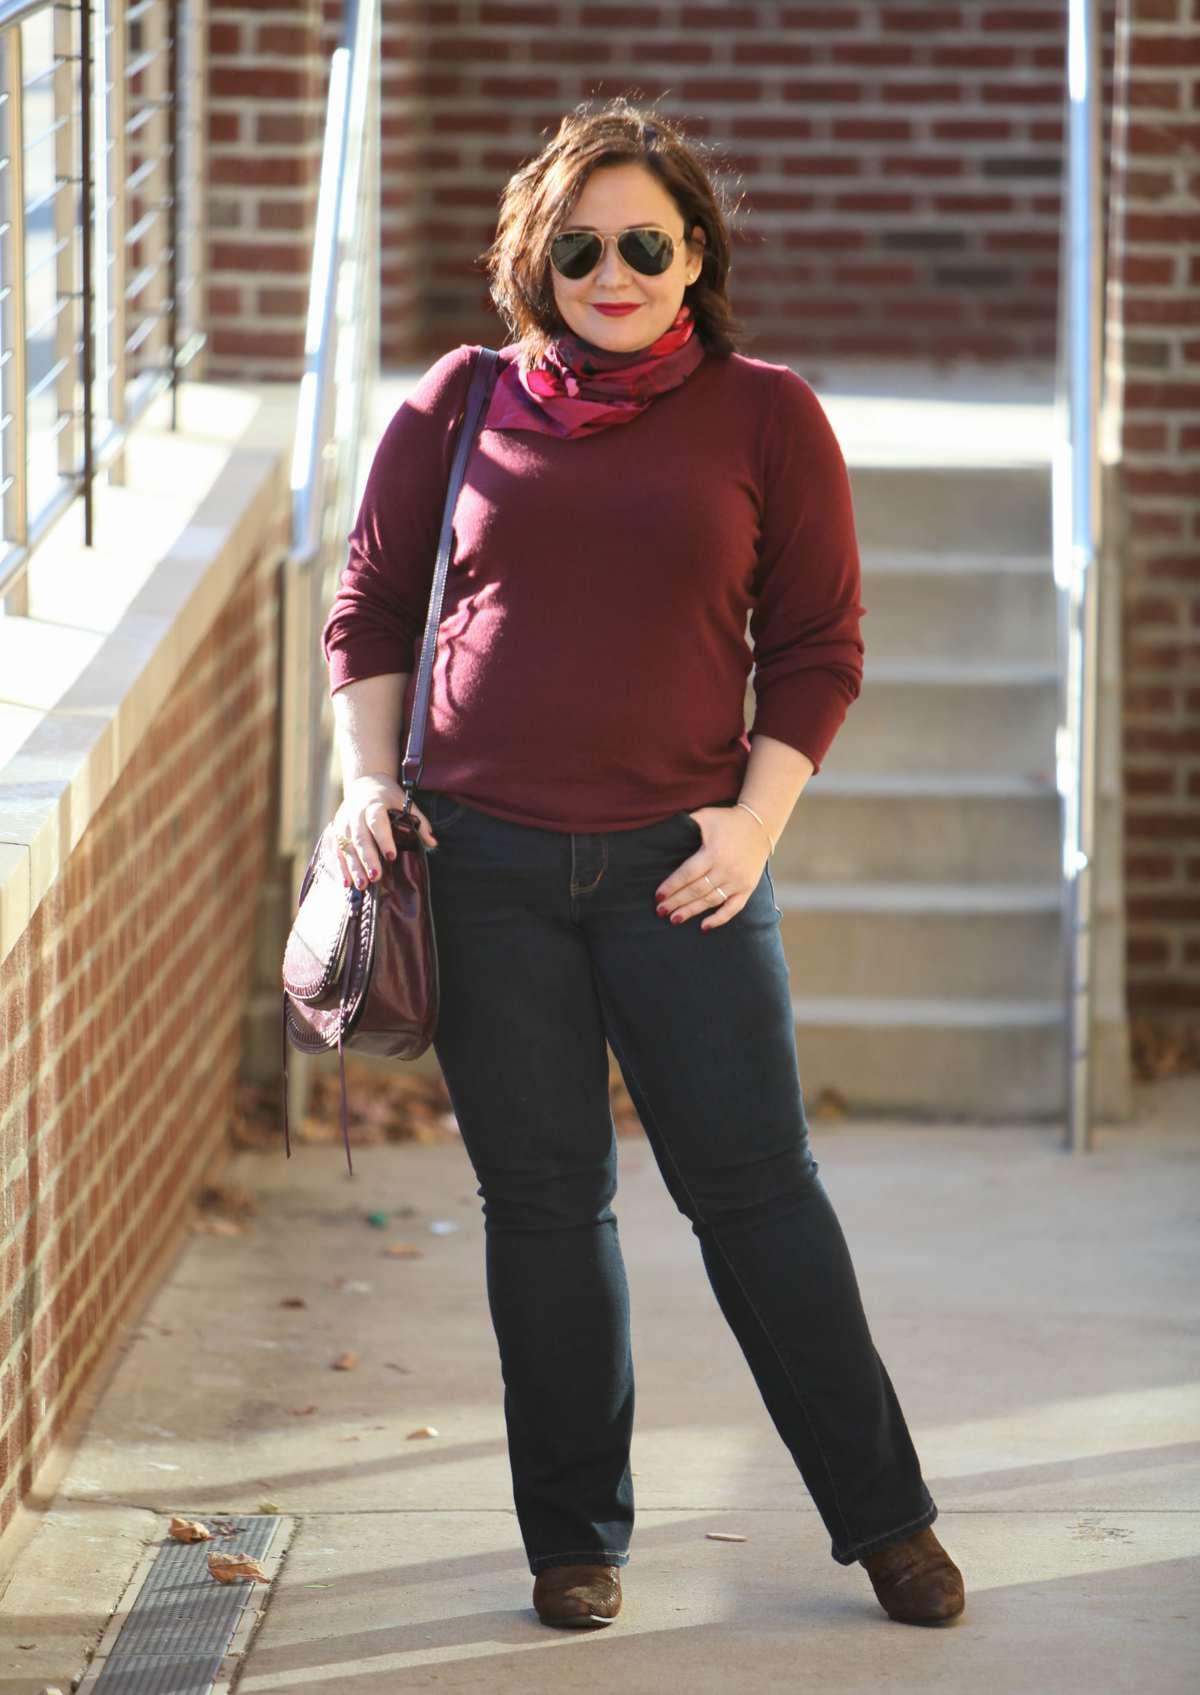 wardrobe-oxygen-over-40-size-14-fashion-blog